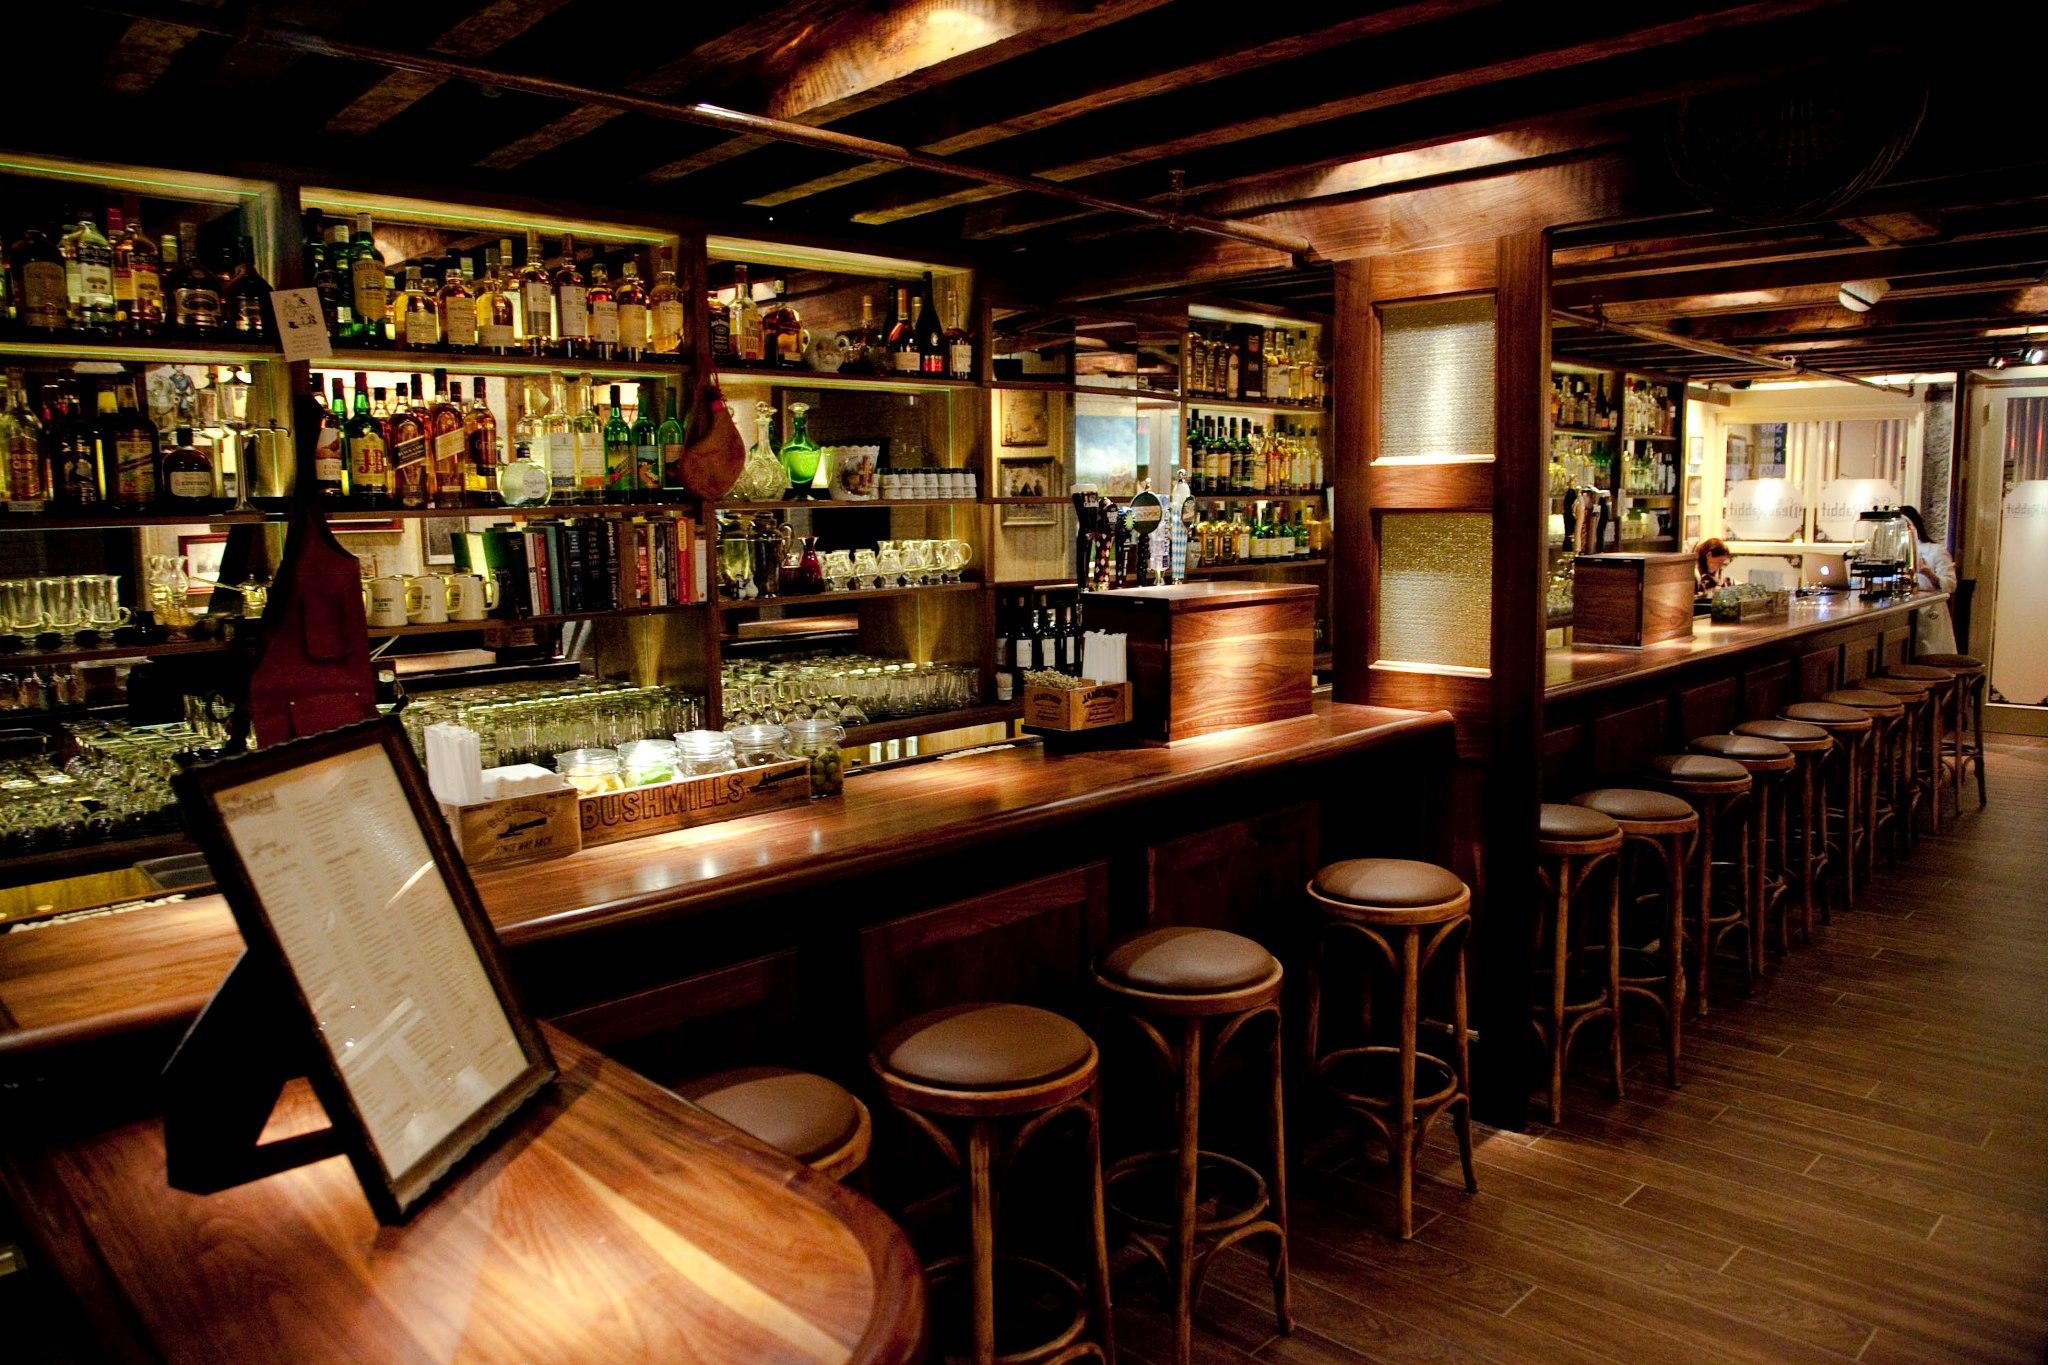 Best-Restaurants-Bars-To-Visit-Bachelor-Party-Panama